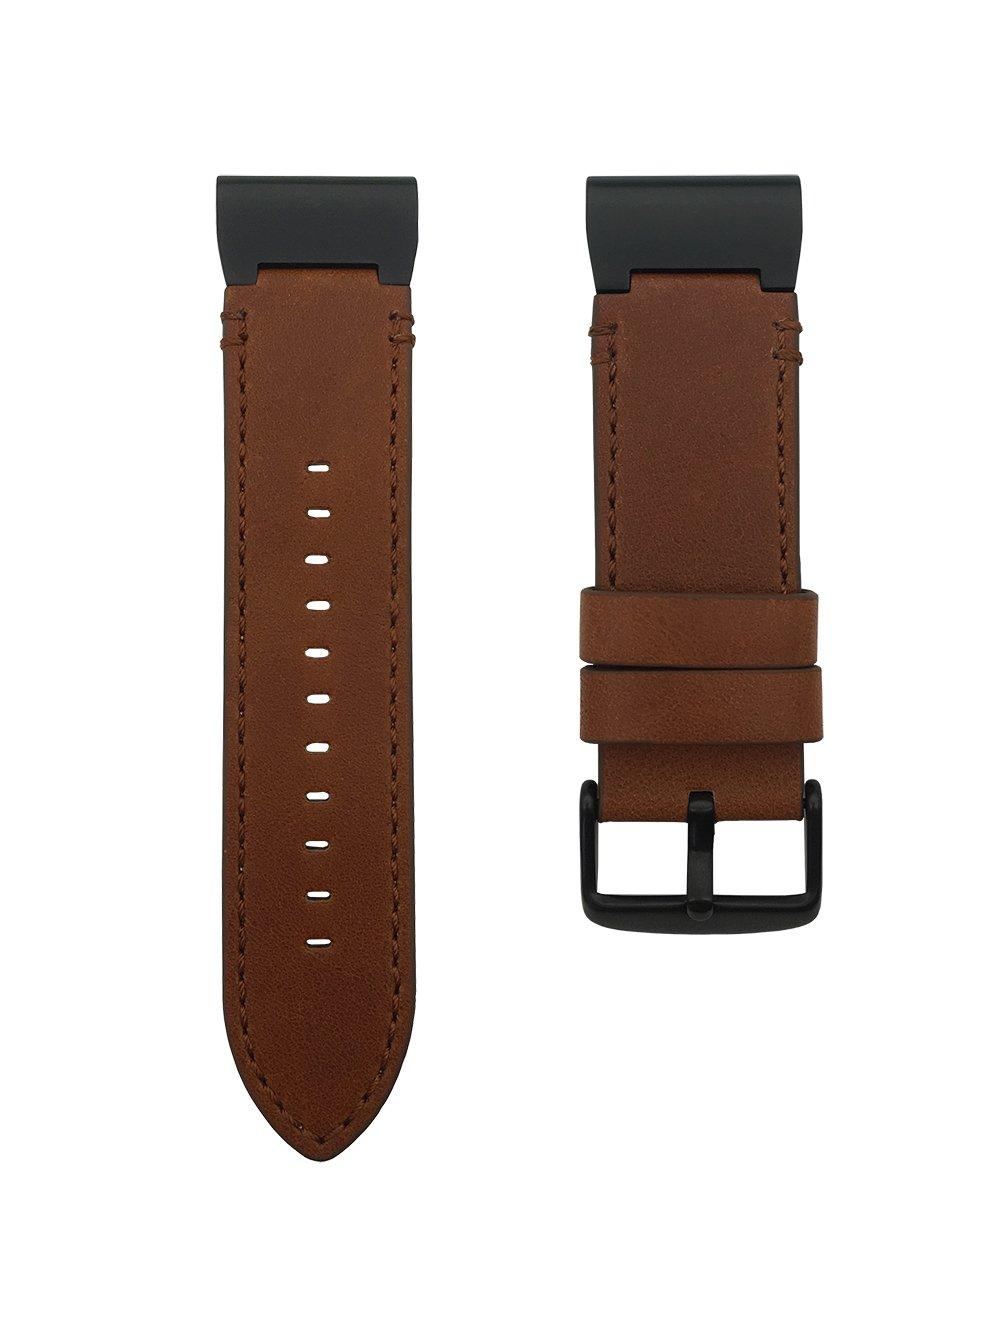 LDFAS Fenix 5X Plus Band, Genuine Leather 26mm Quick Release Easy Fit Watch Bands for Garmin Fenix 5X/5X Plus/3/3HR/Descent Mk1 Smartwatch, Brown/Black